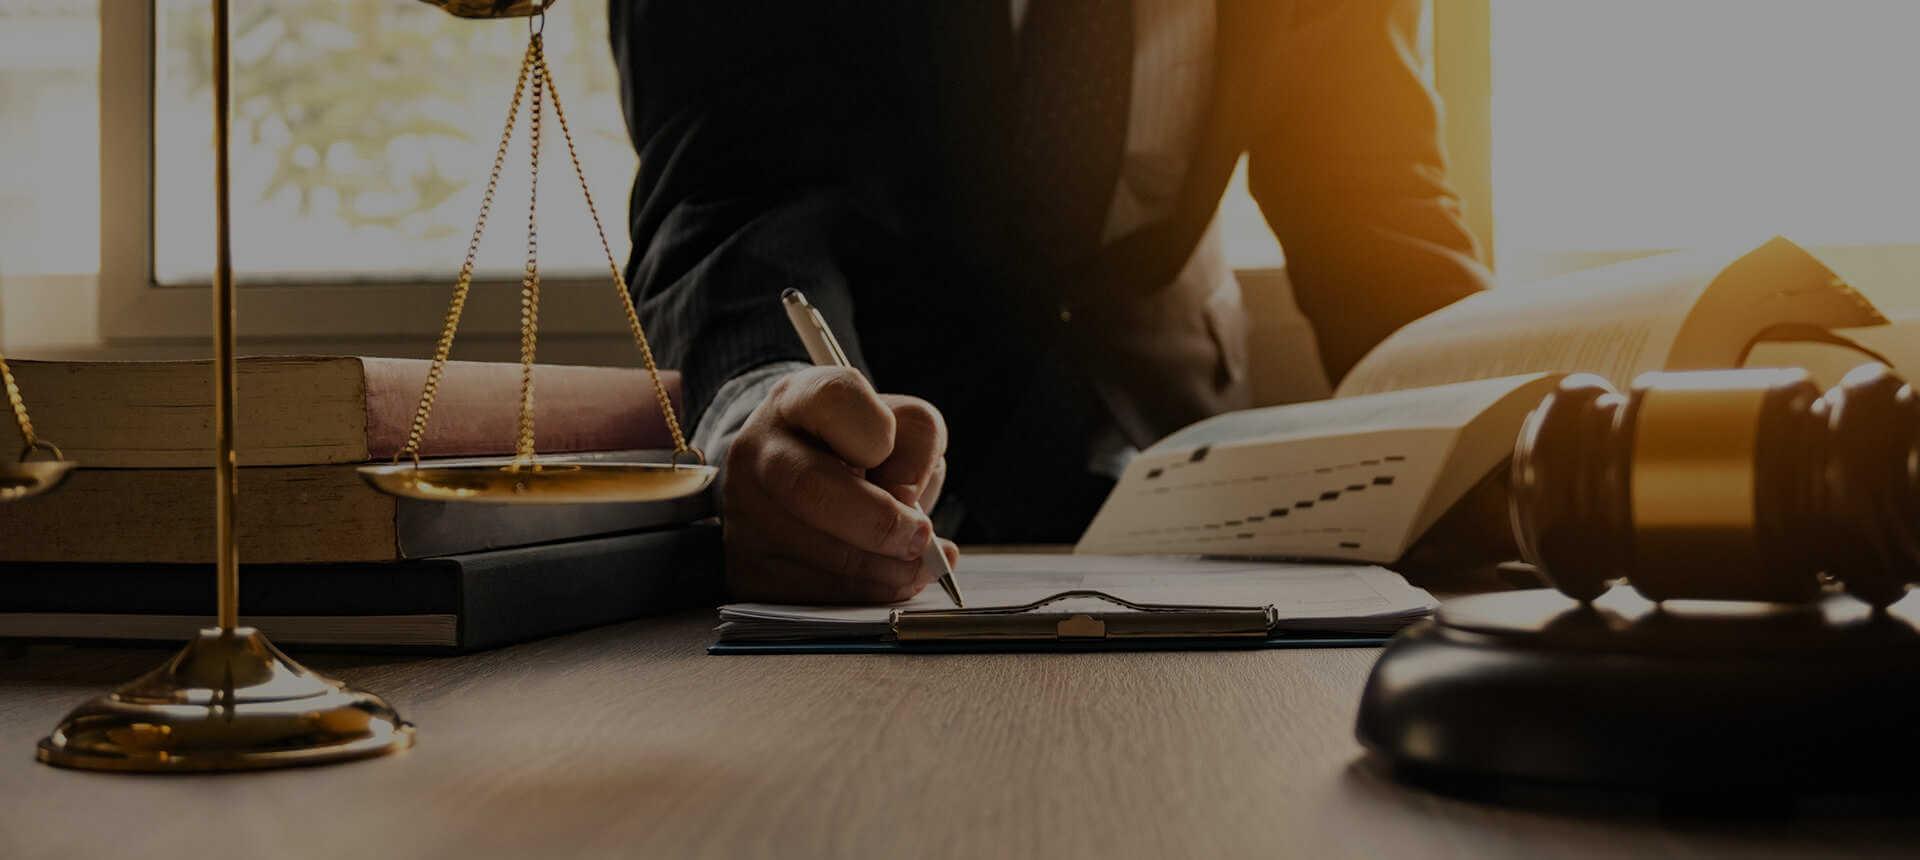 immigration law firm new york - Berd & Klauss, PLLC